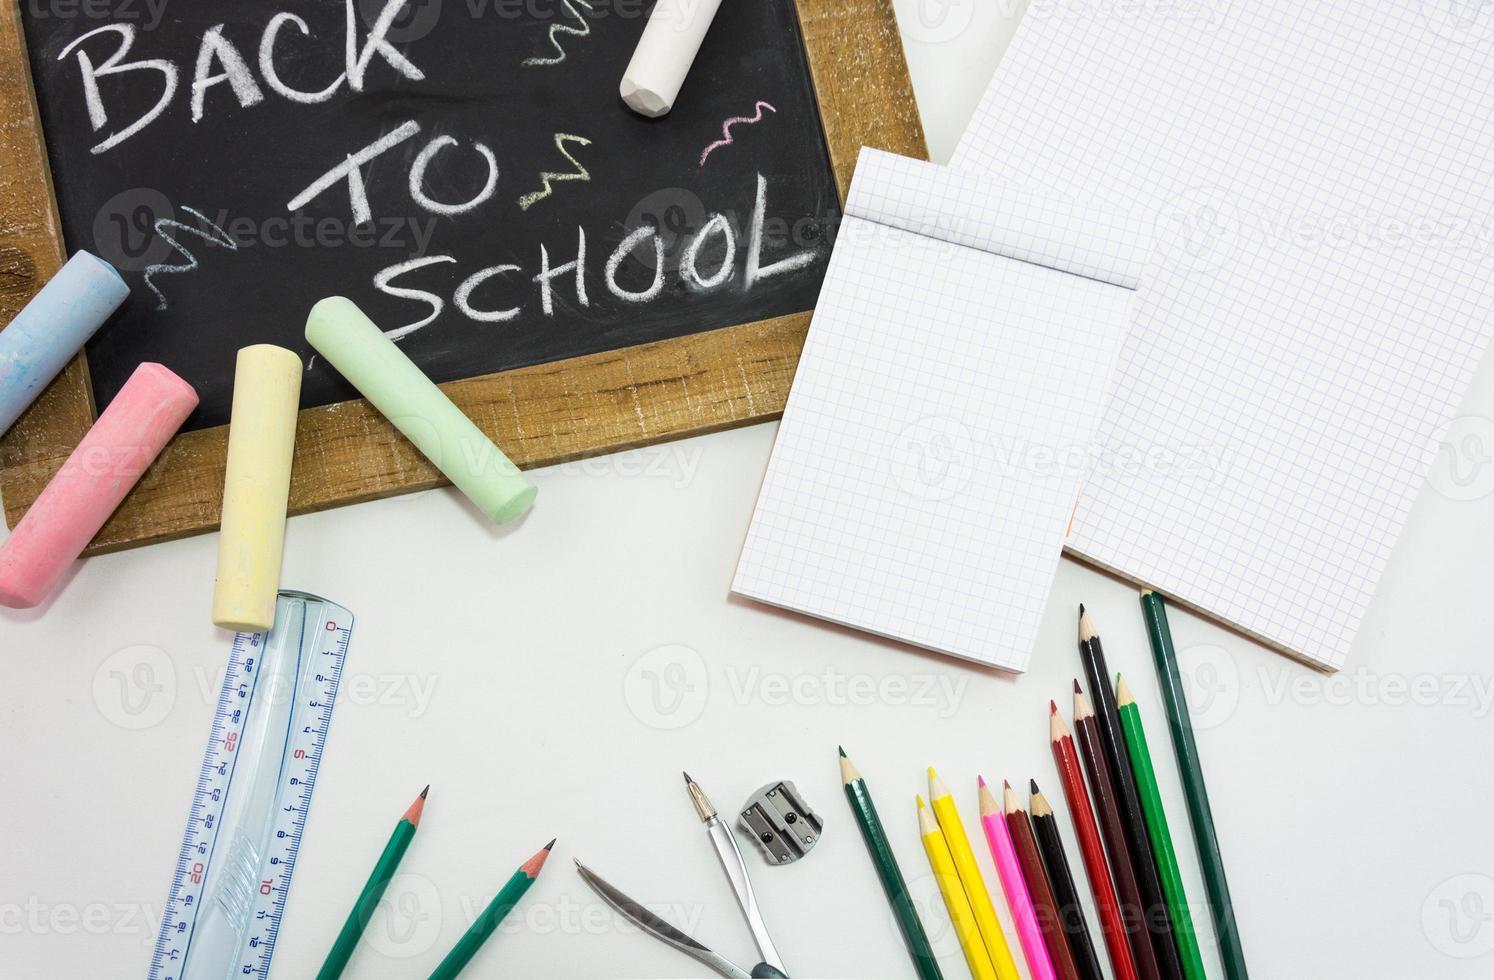 Back to school slate photo